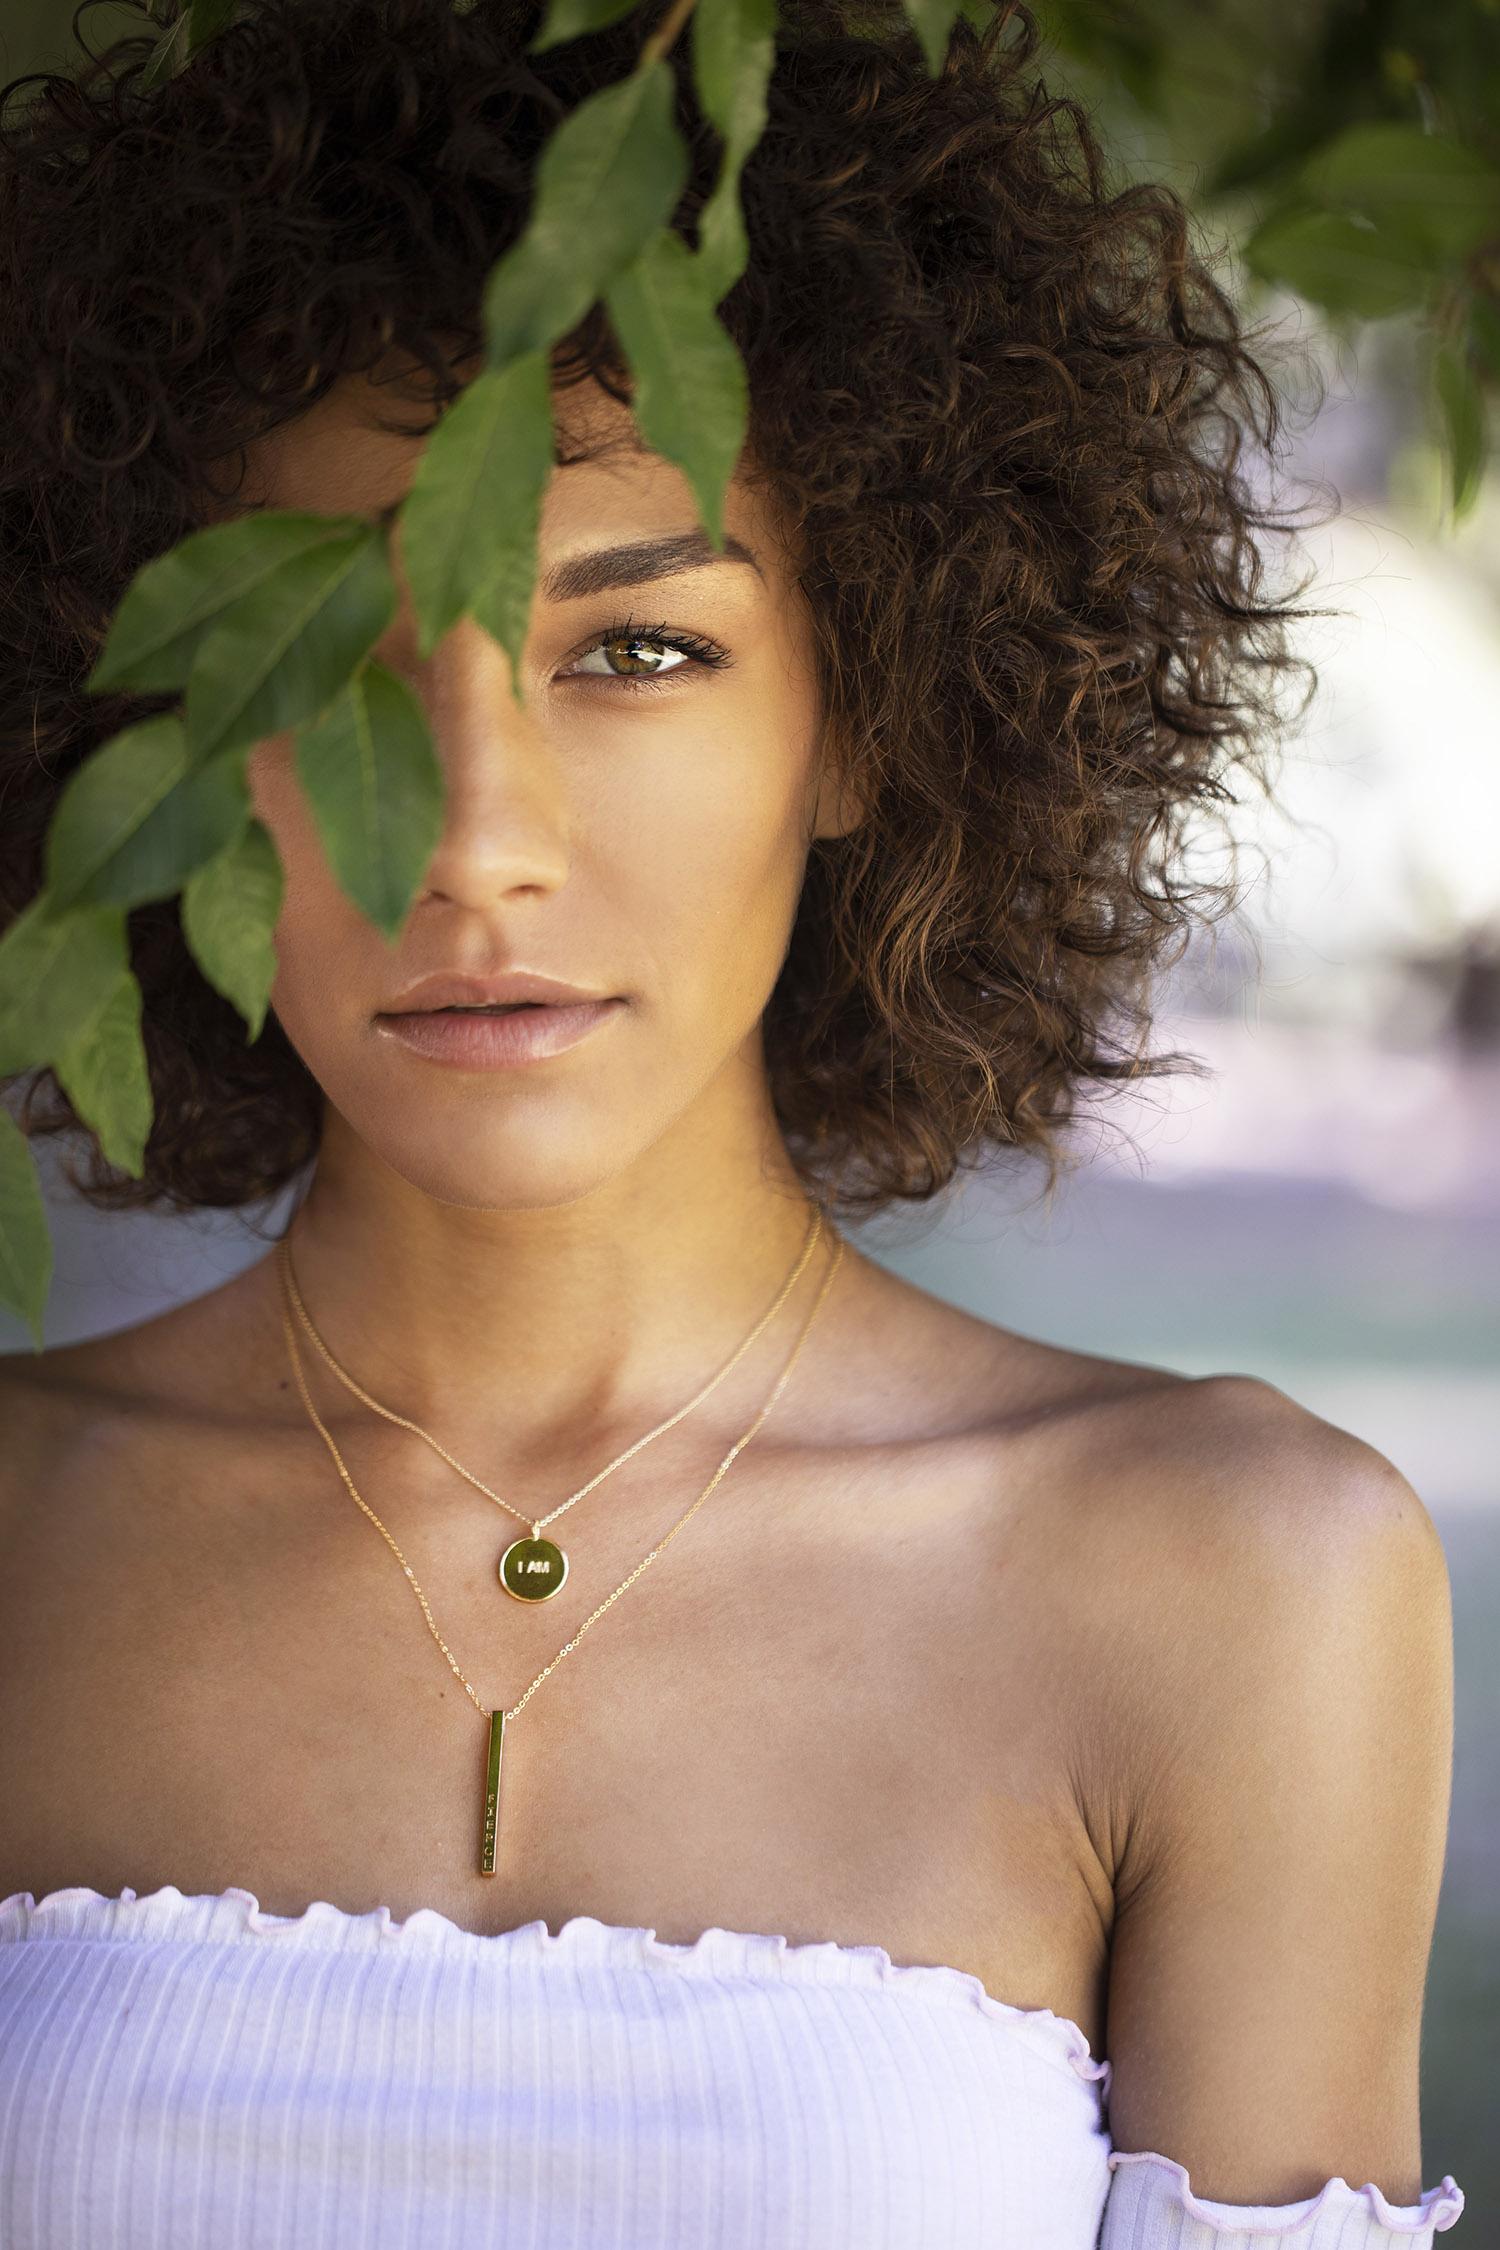 Branding shoot for jewelry line: InfiniteSisters.com